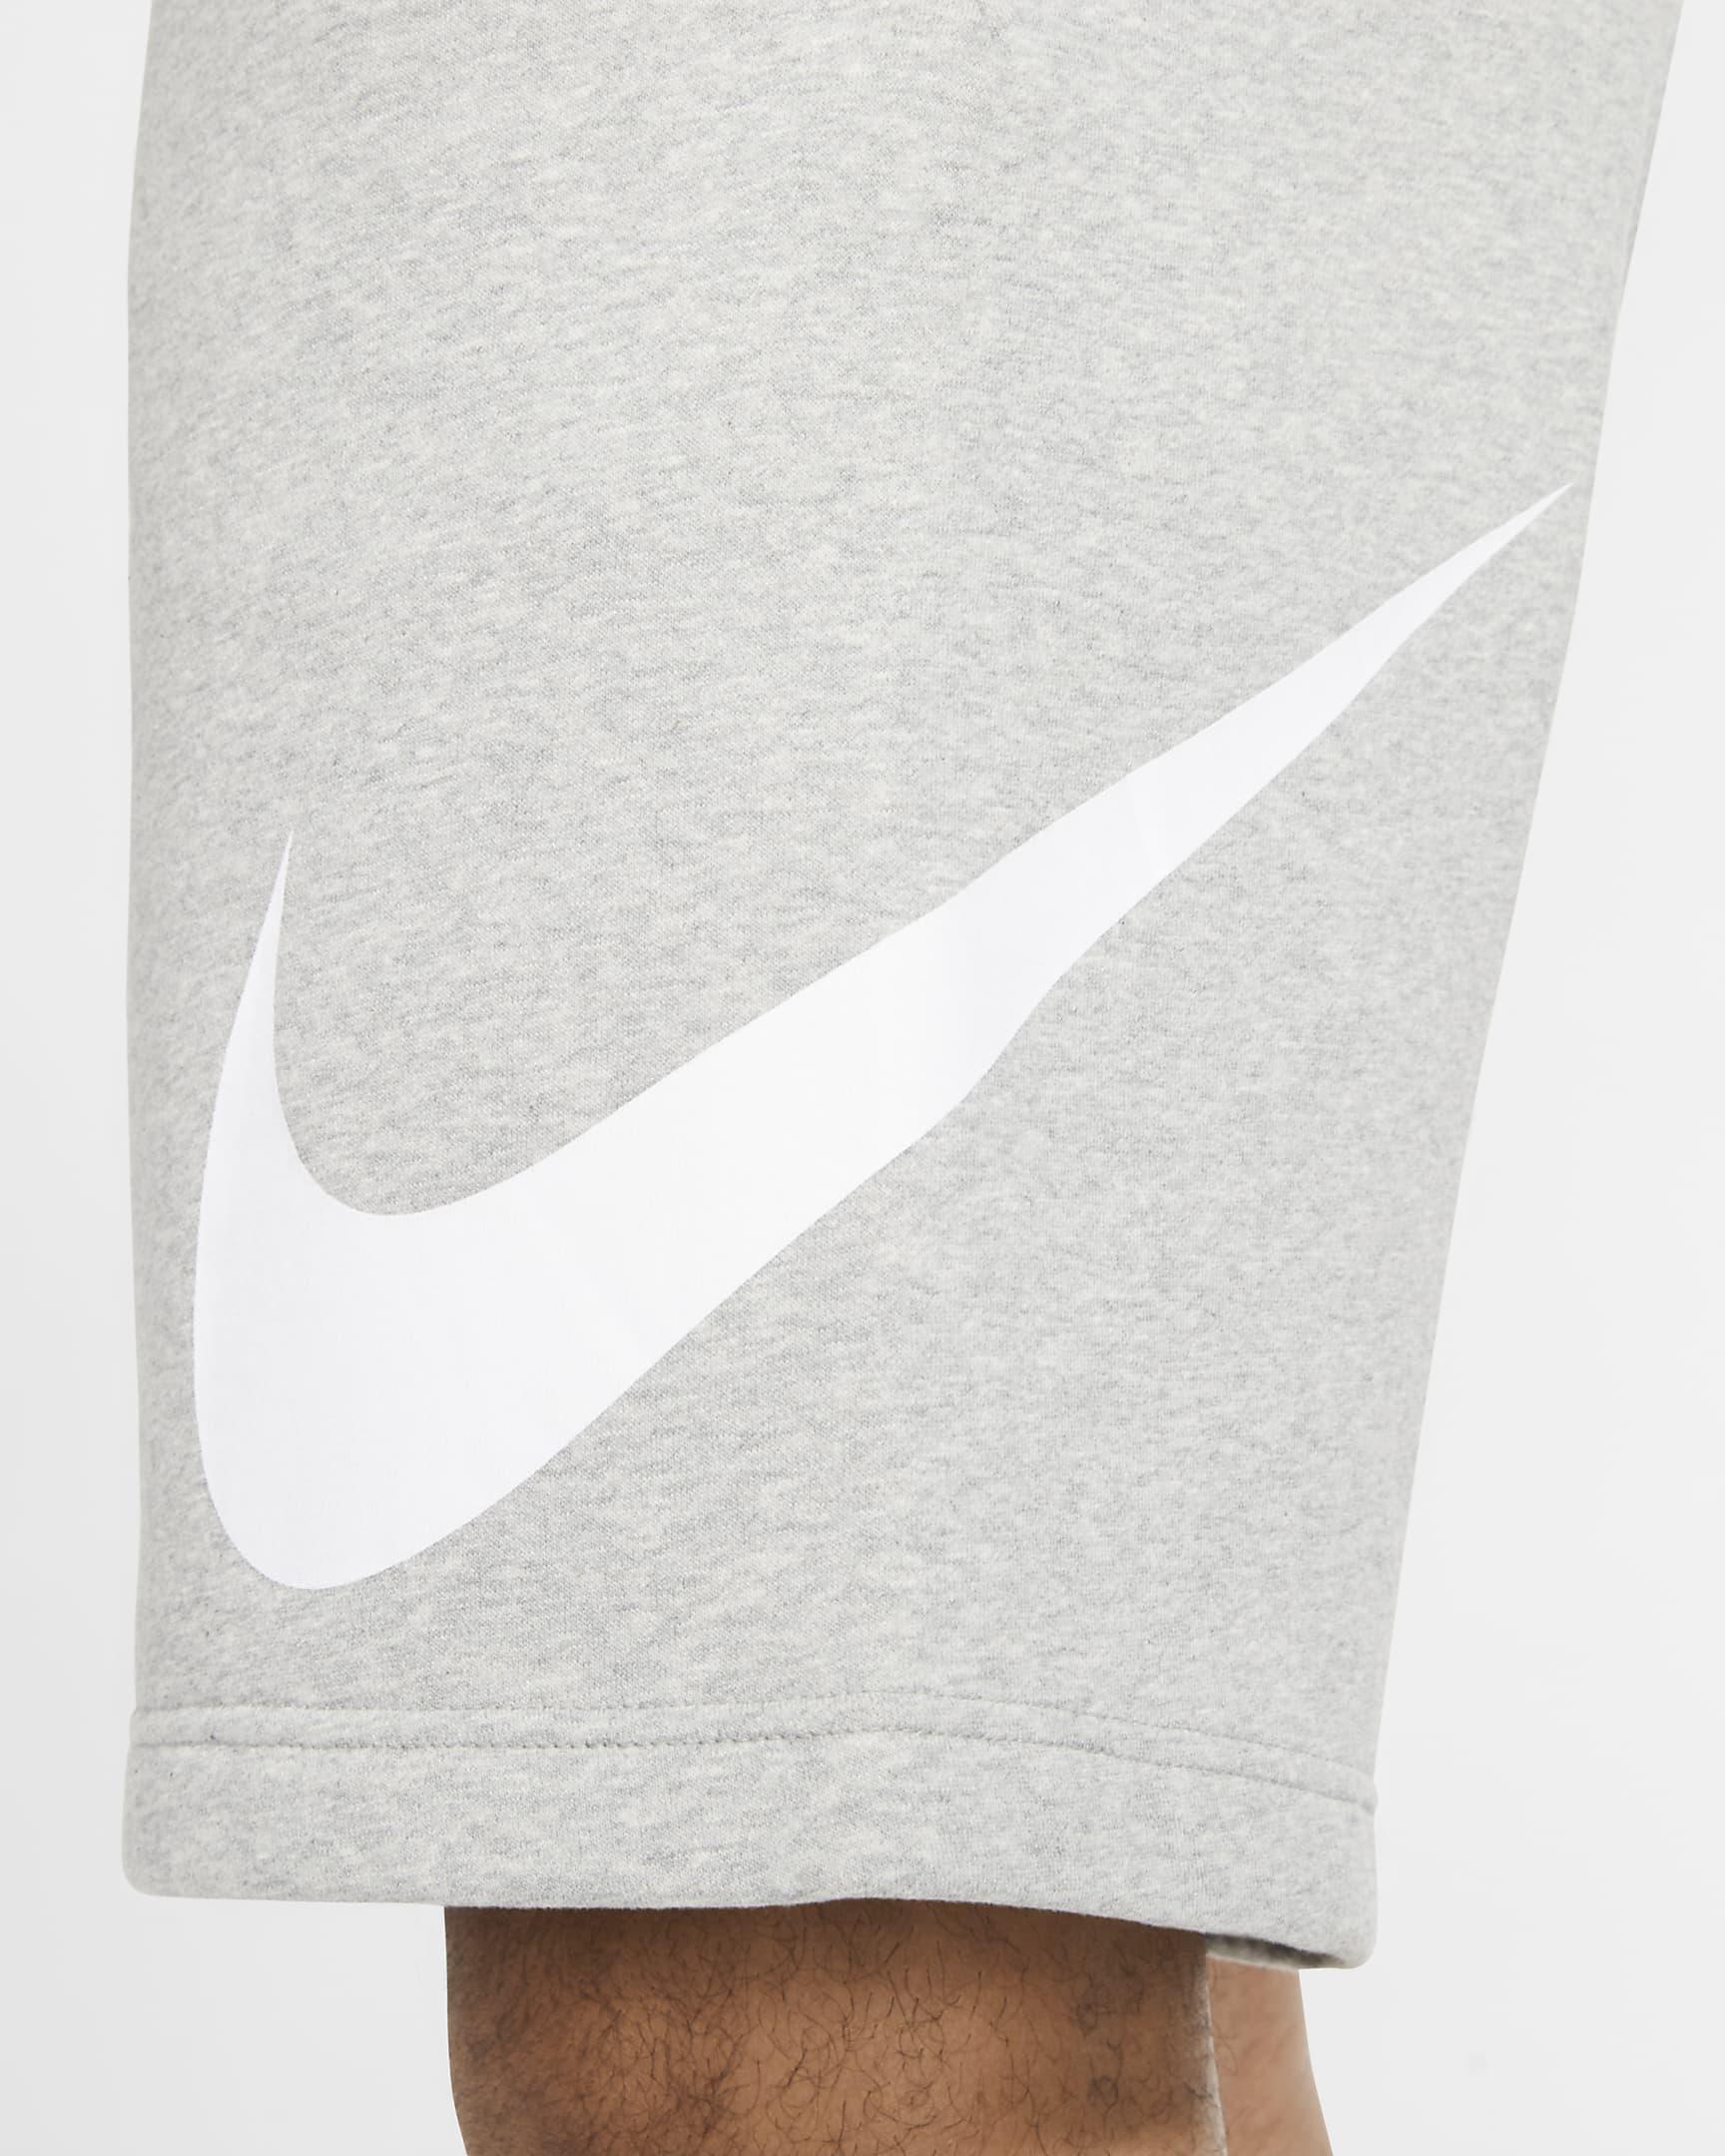 nike-sportswear-club-mens-graphic-shorts-hQgvng-1.png